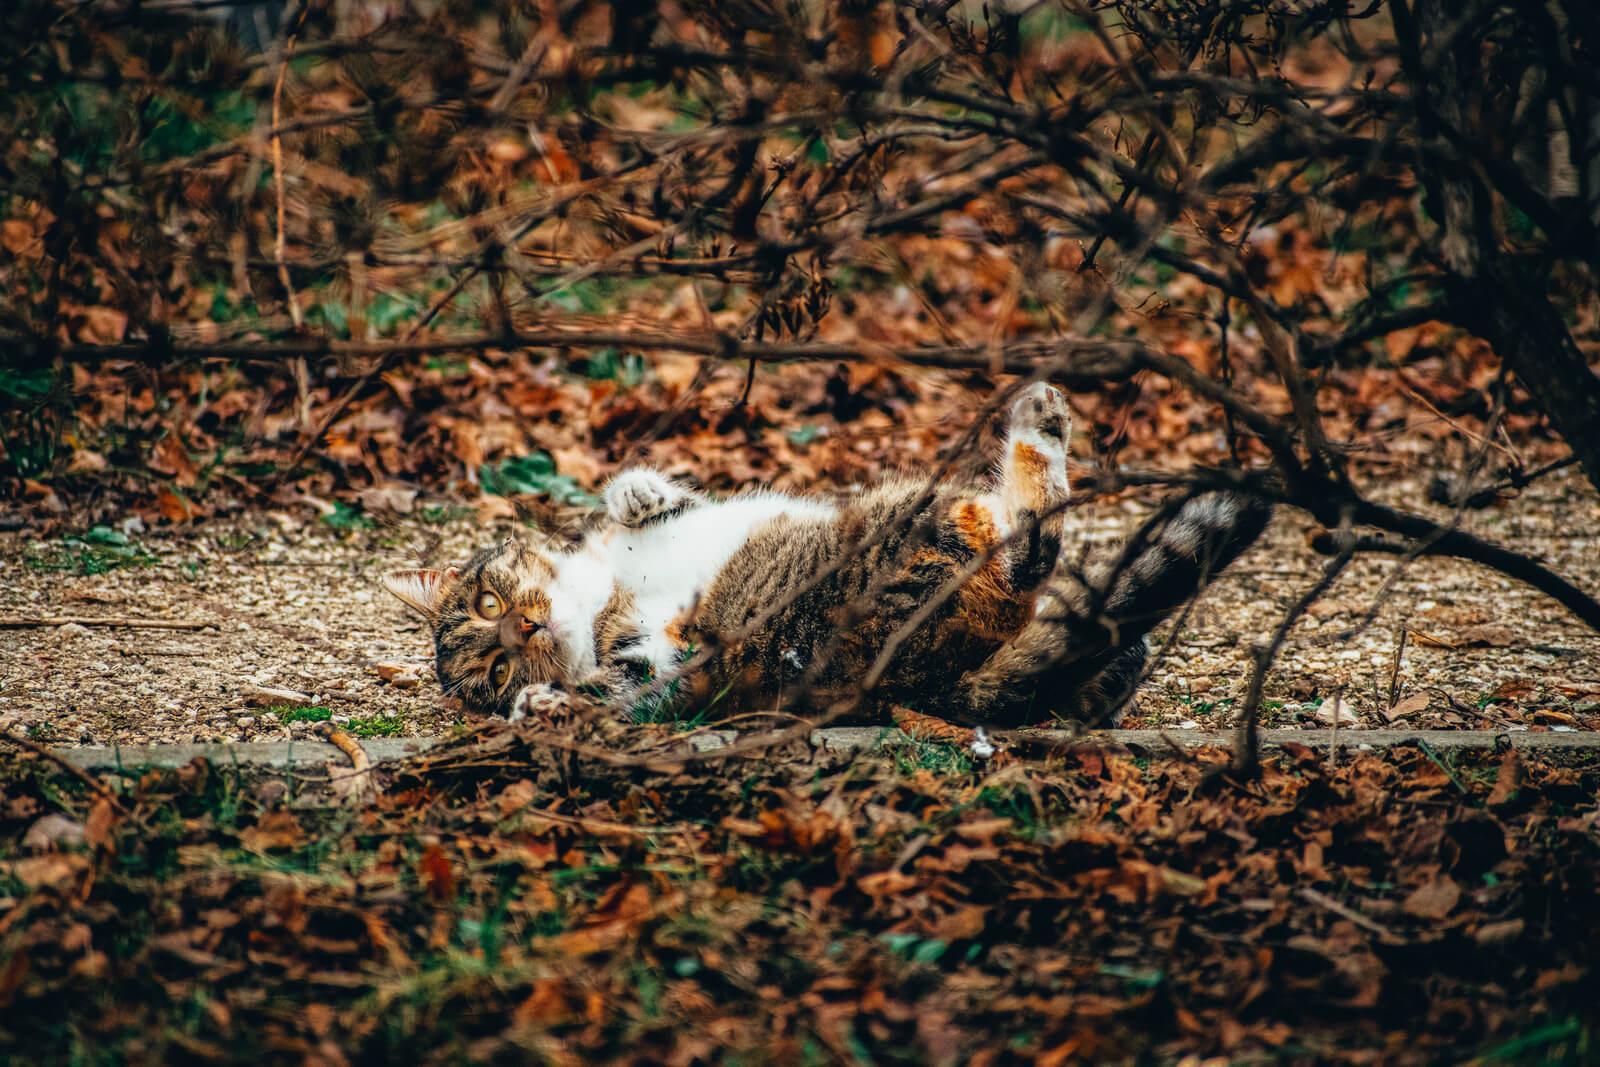 Macska a kertben